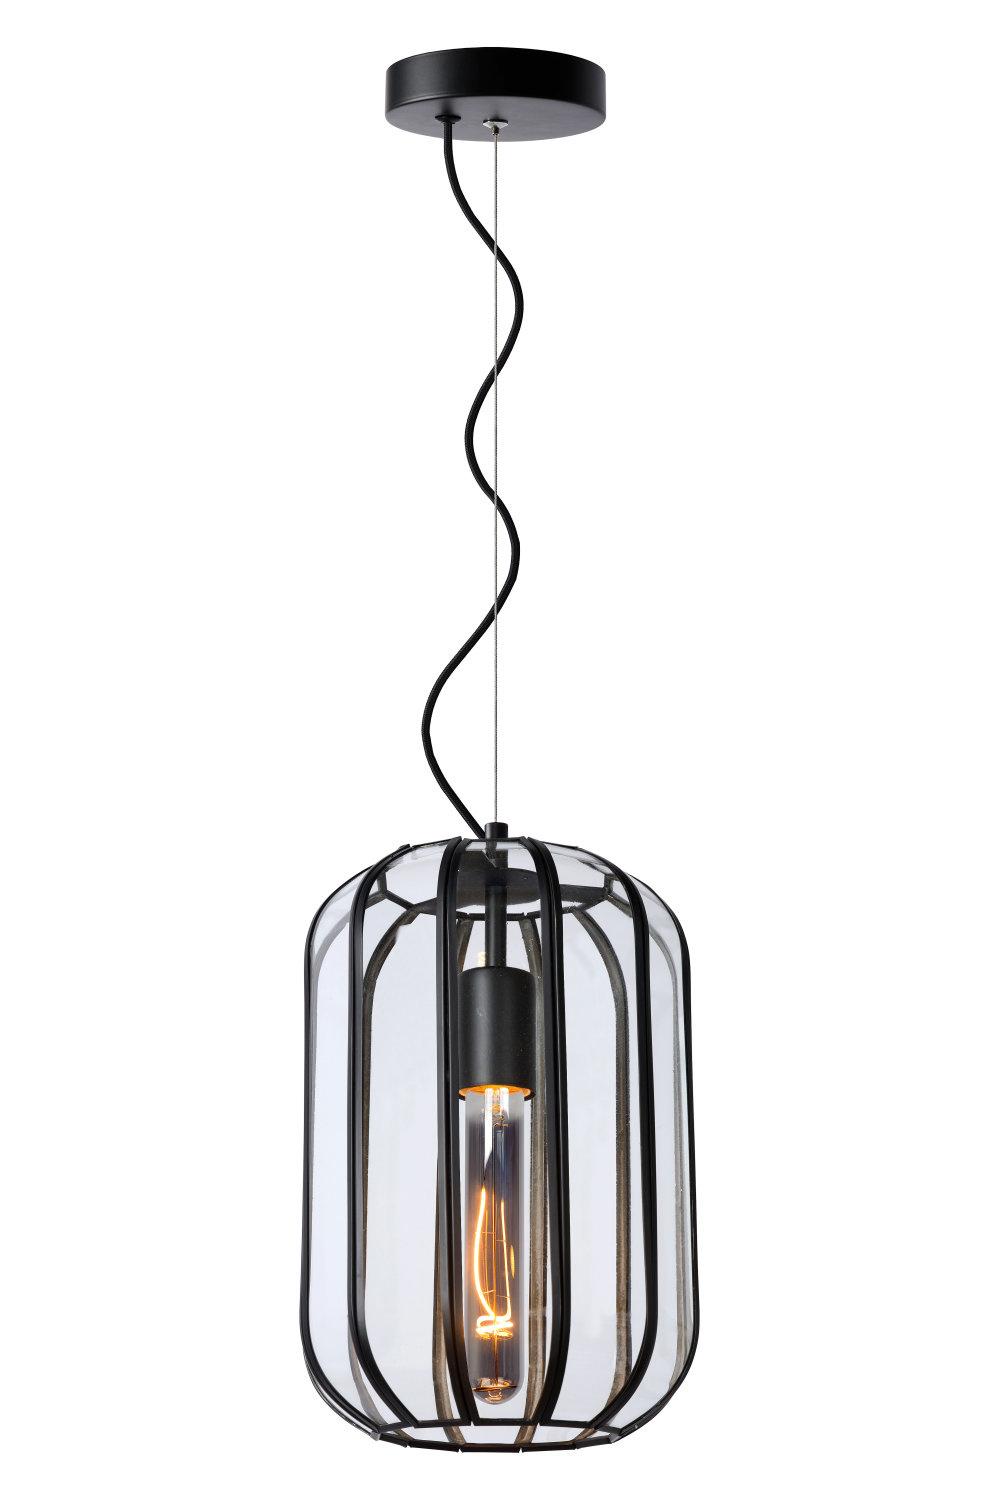 Lucide FERN Hanglamp-Zwart-Ø20-1xE27-60W-Glas